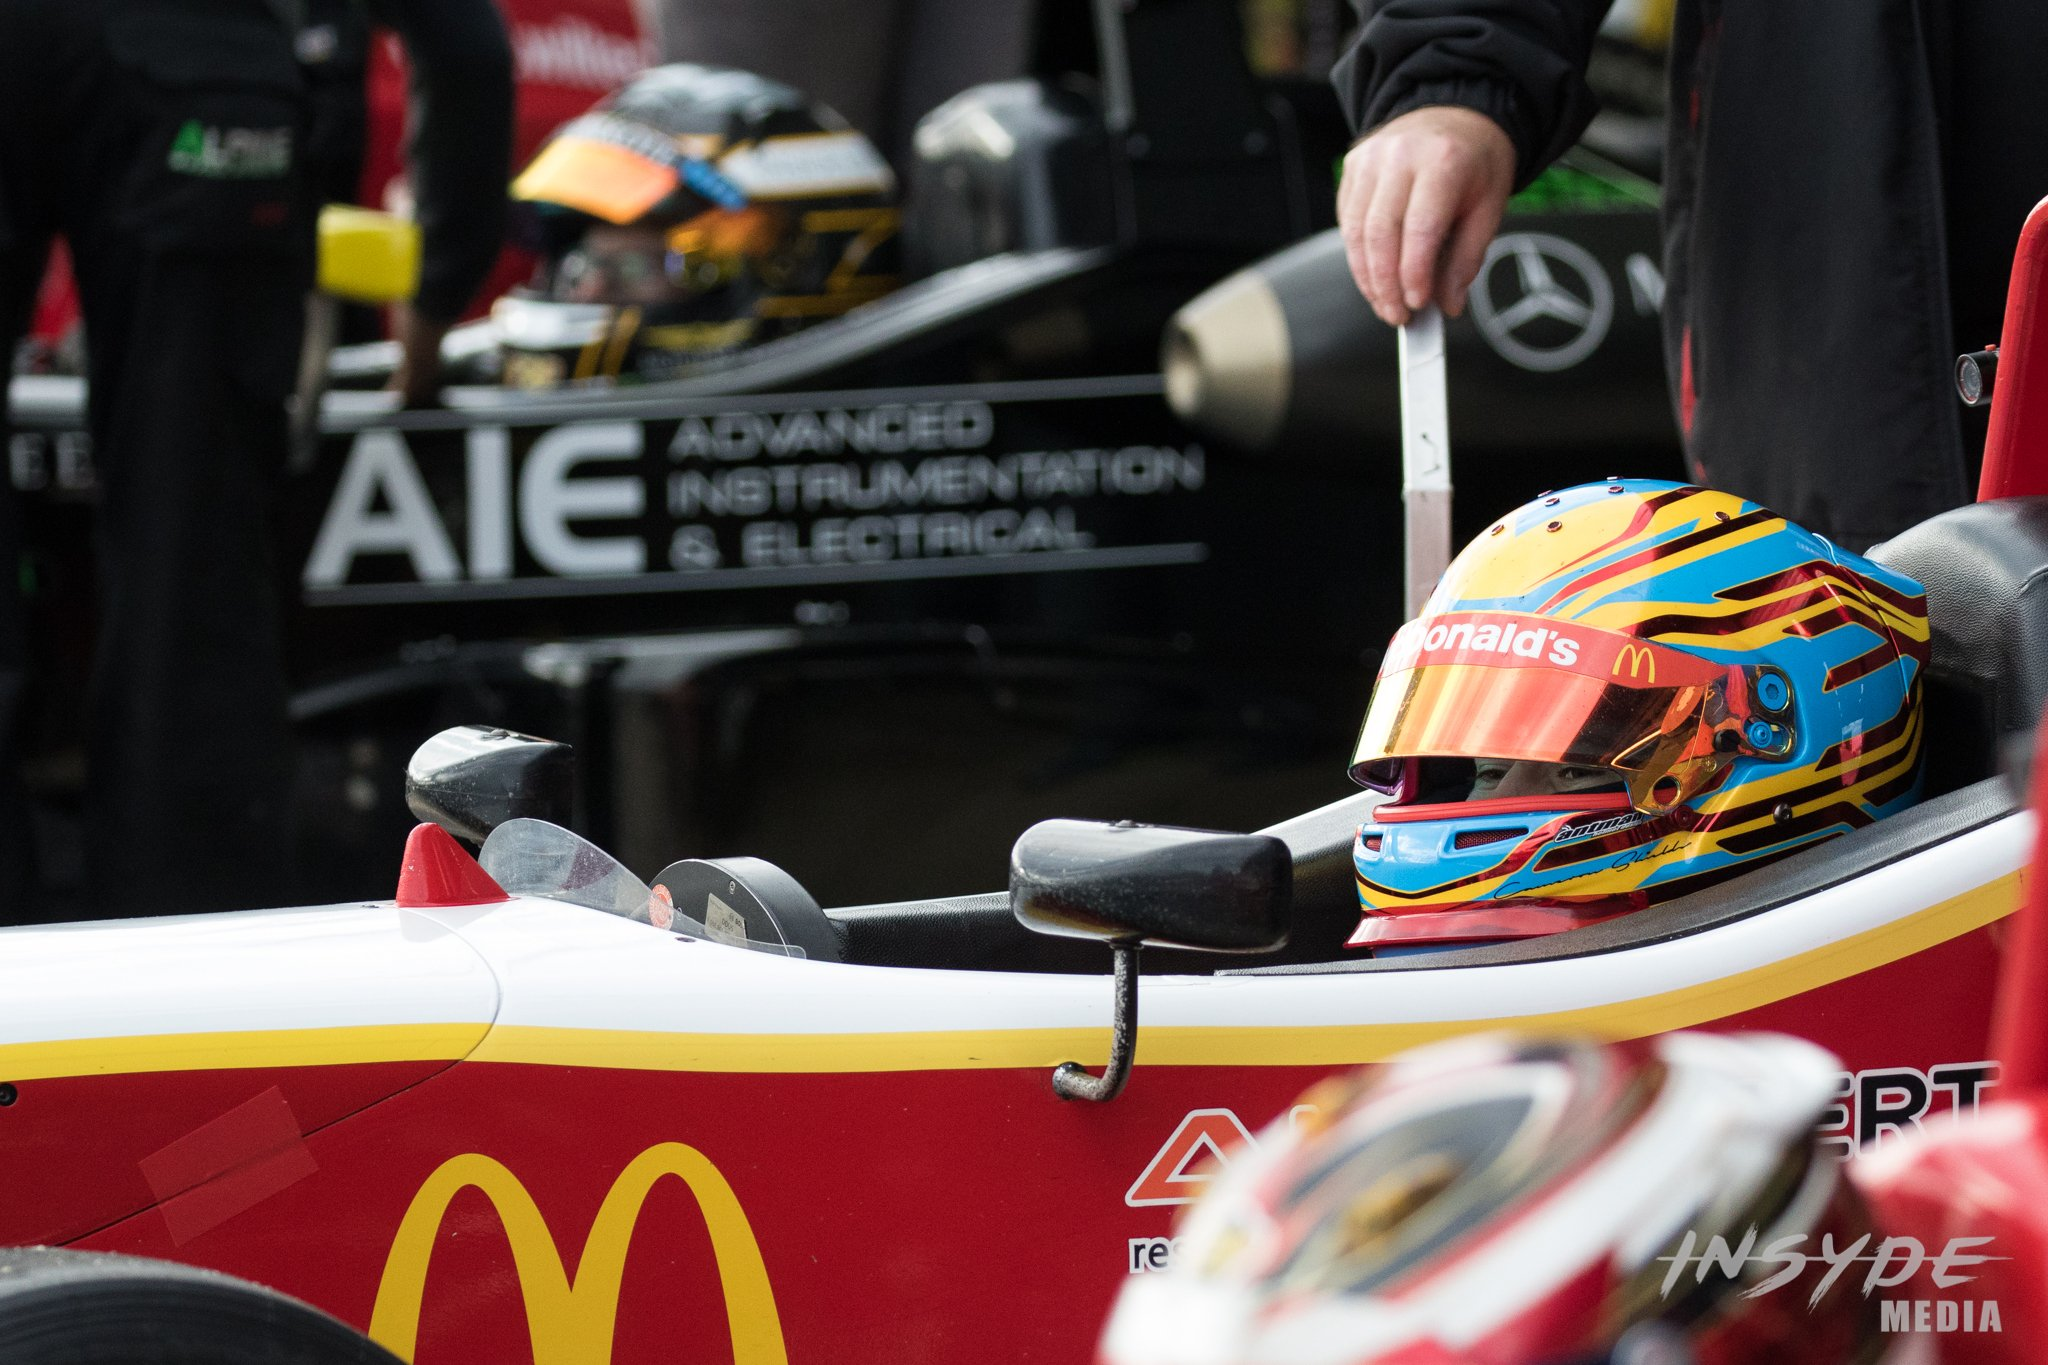 Motorsport-SN-InSydeMedia-002